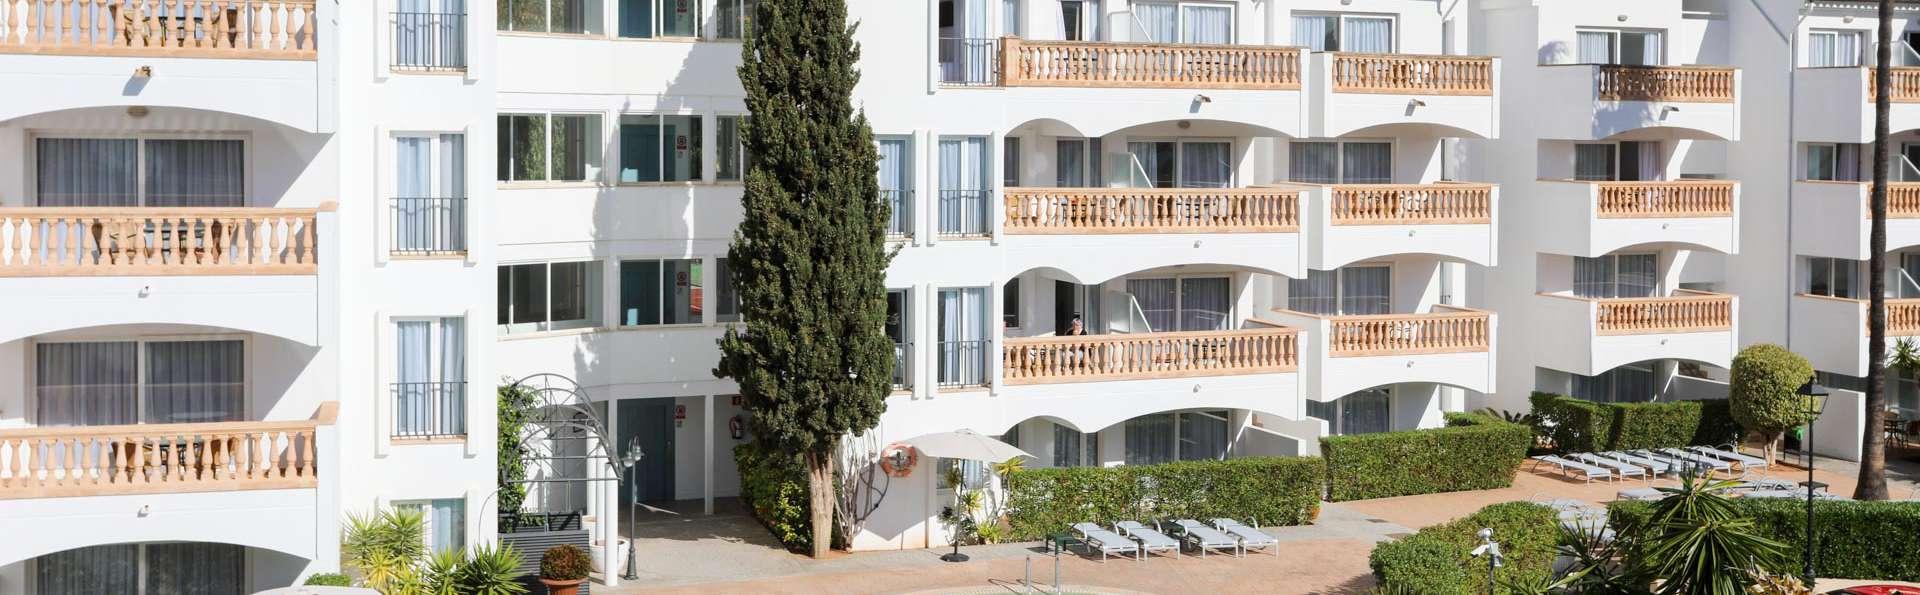 Aparthotel La Pérgola  - EDIT_POOL_05.jpg